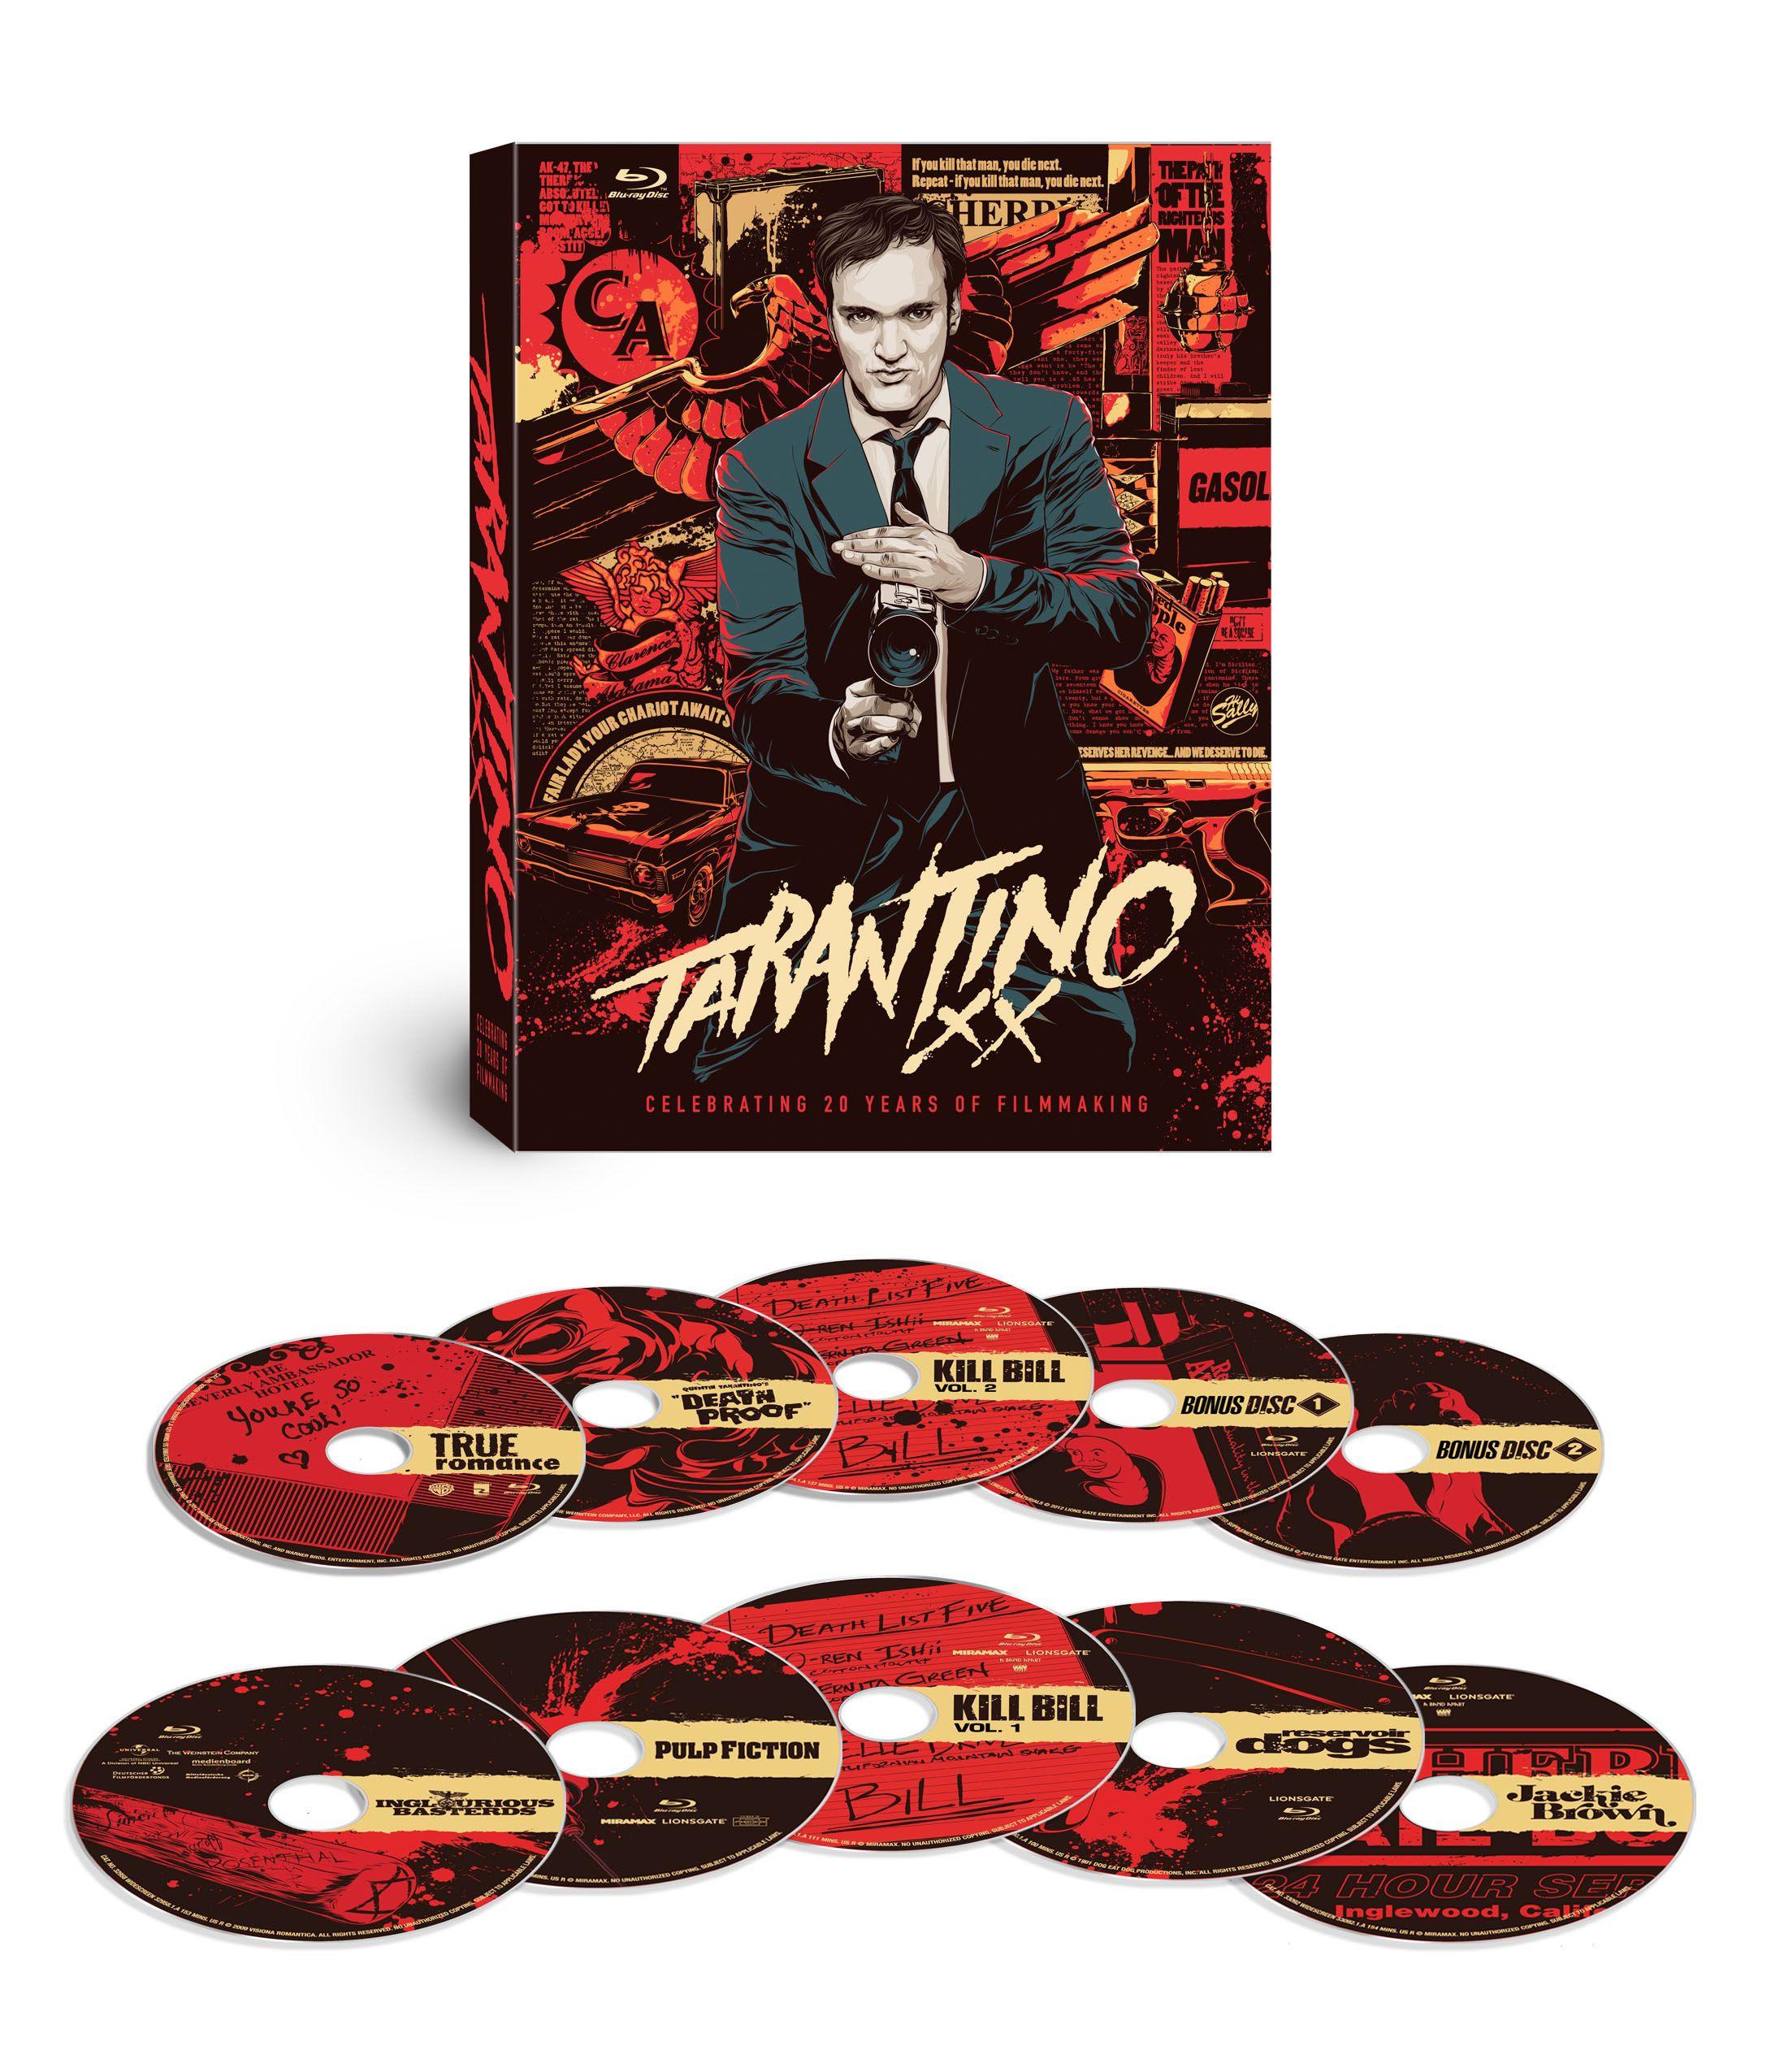 Topgun according to Tarantino - YouTube